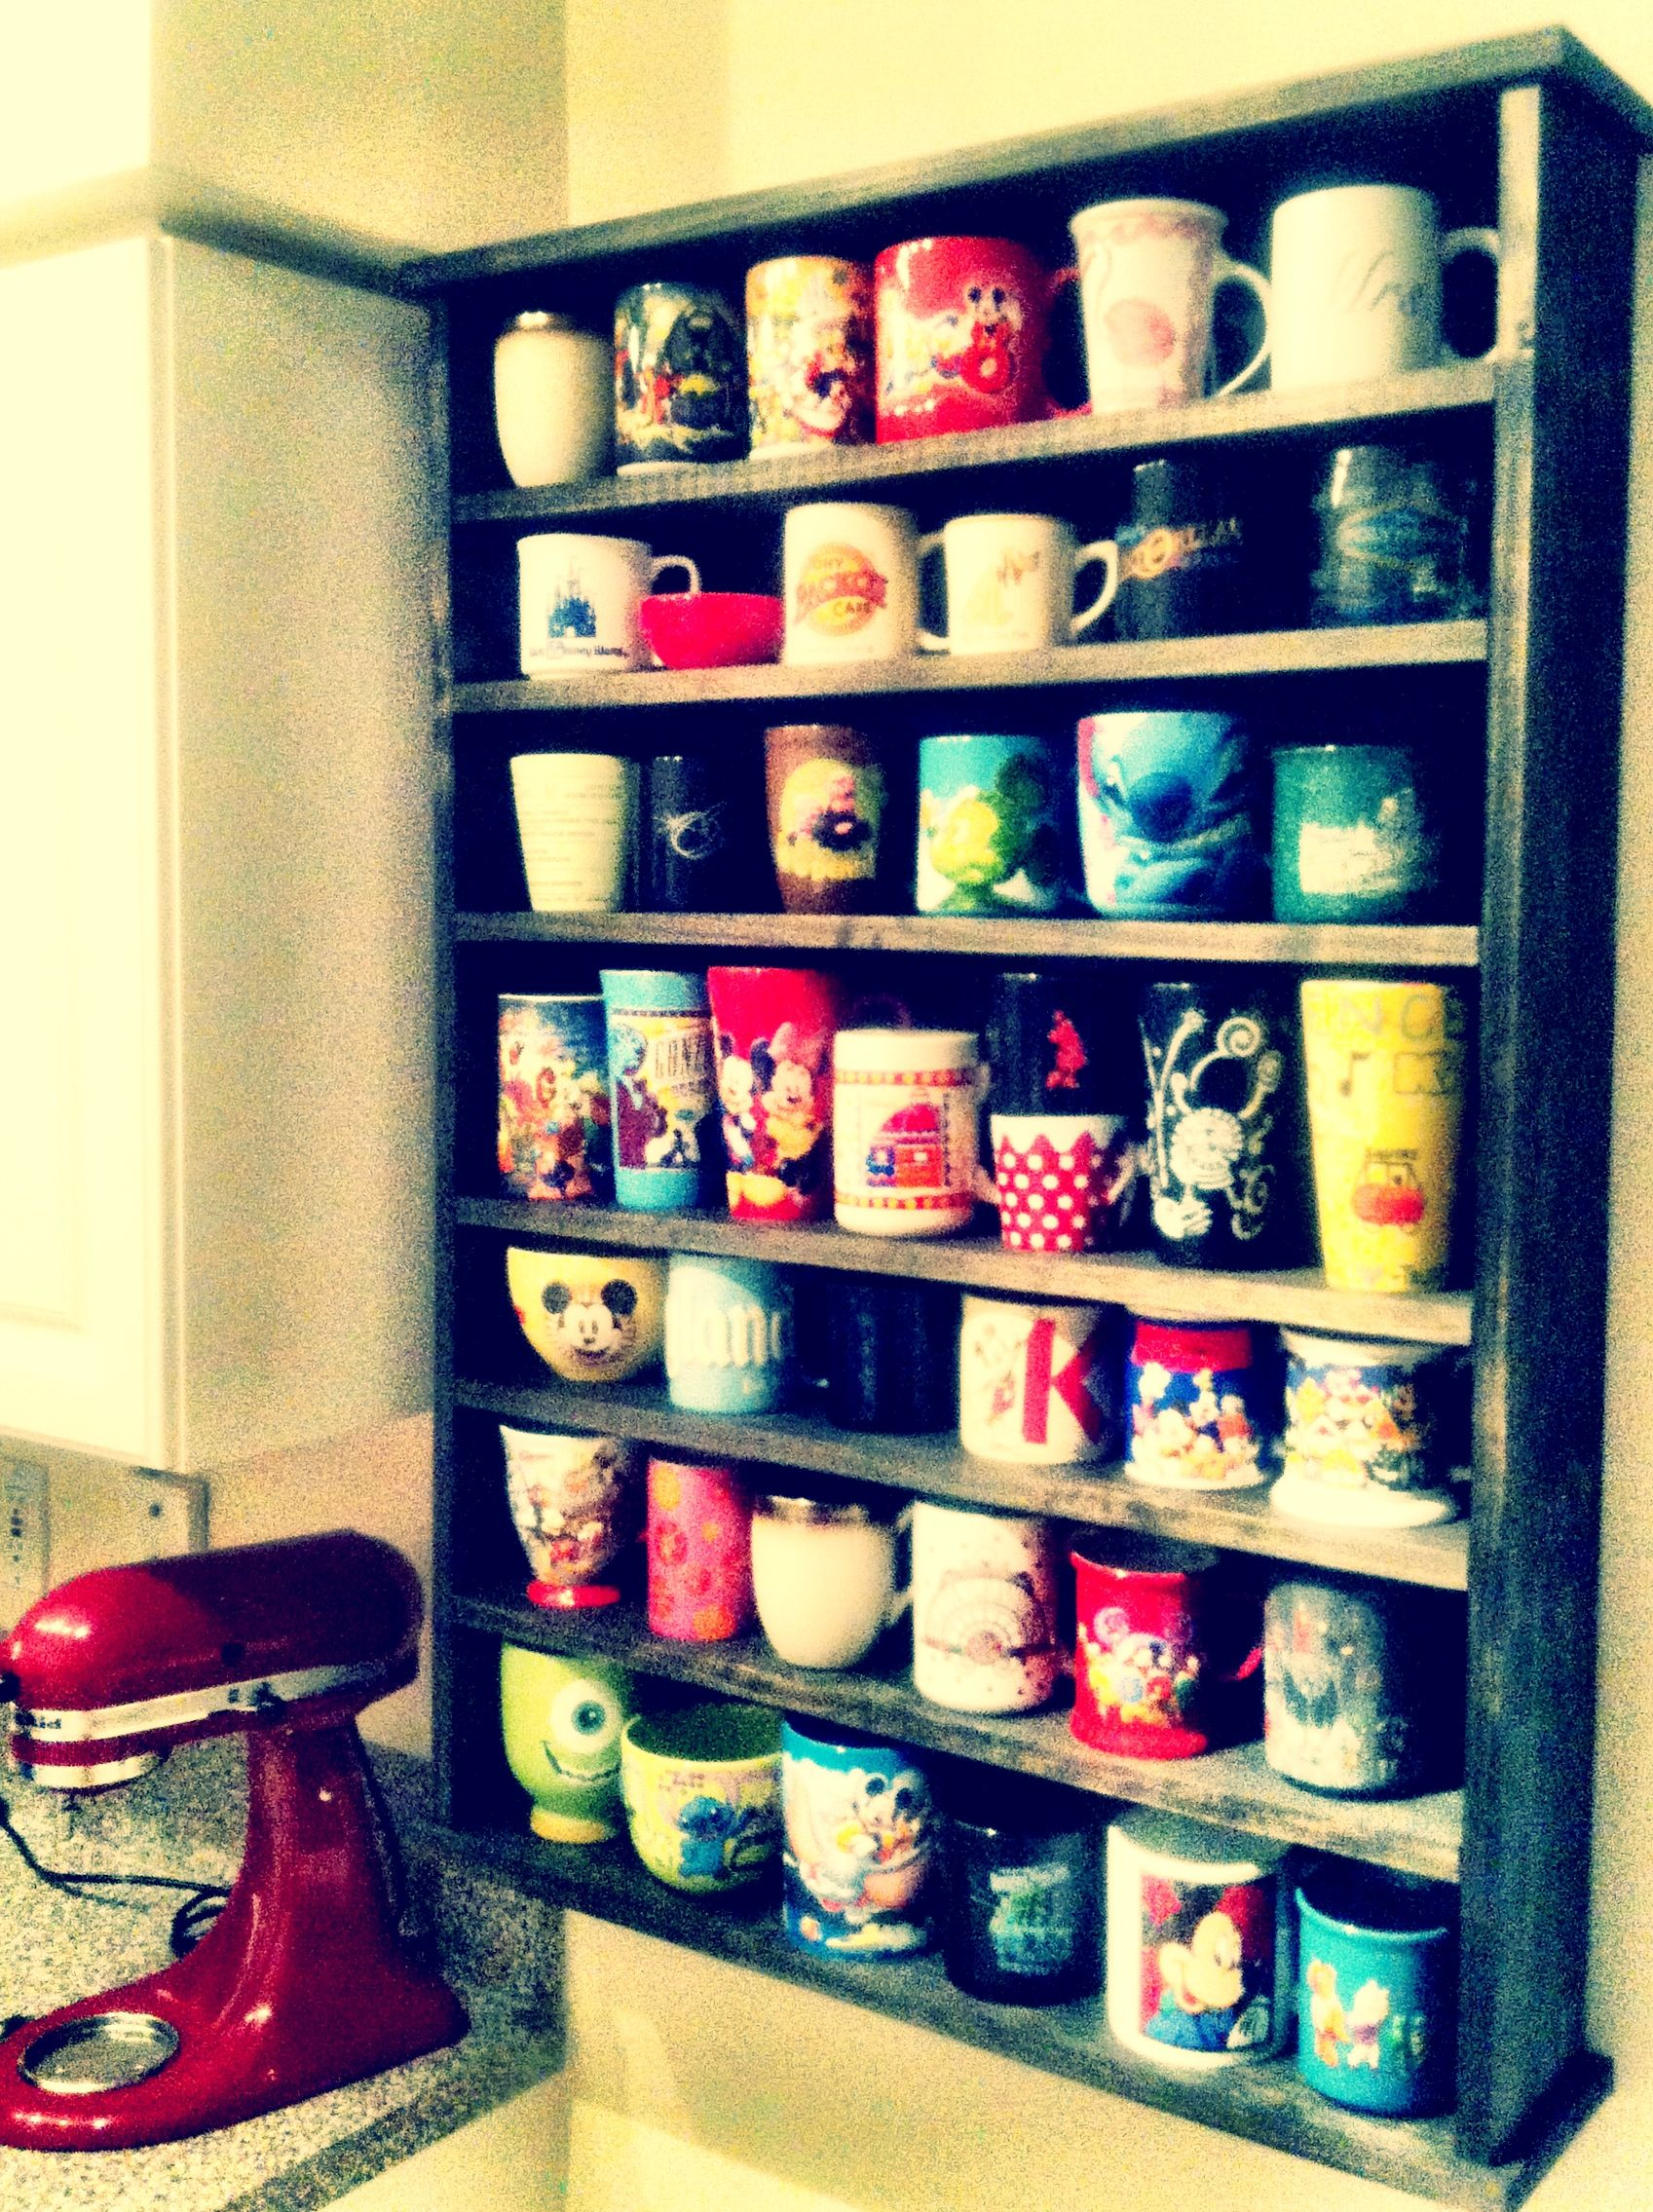 Pin By Giselle On Kitchen Disney Home Decor Coffee Mug Display Disney Kitchen